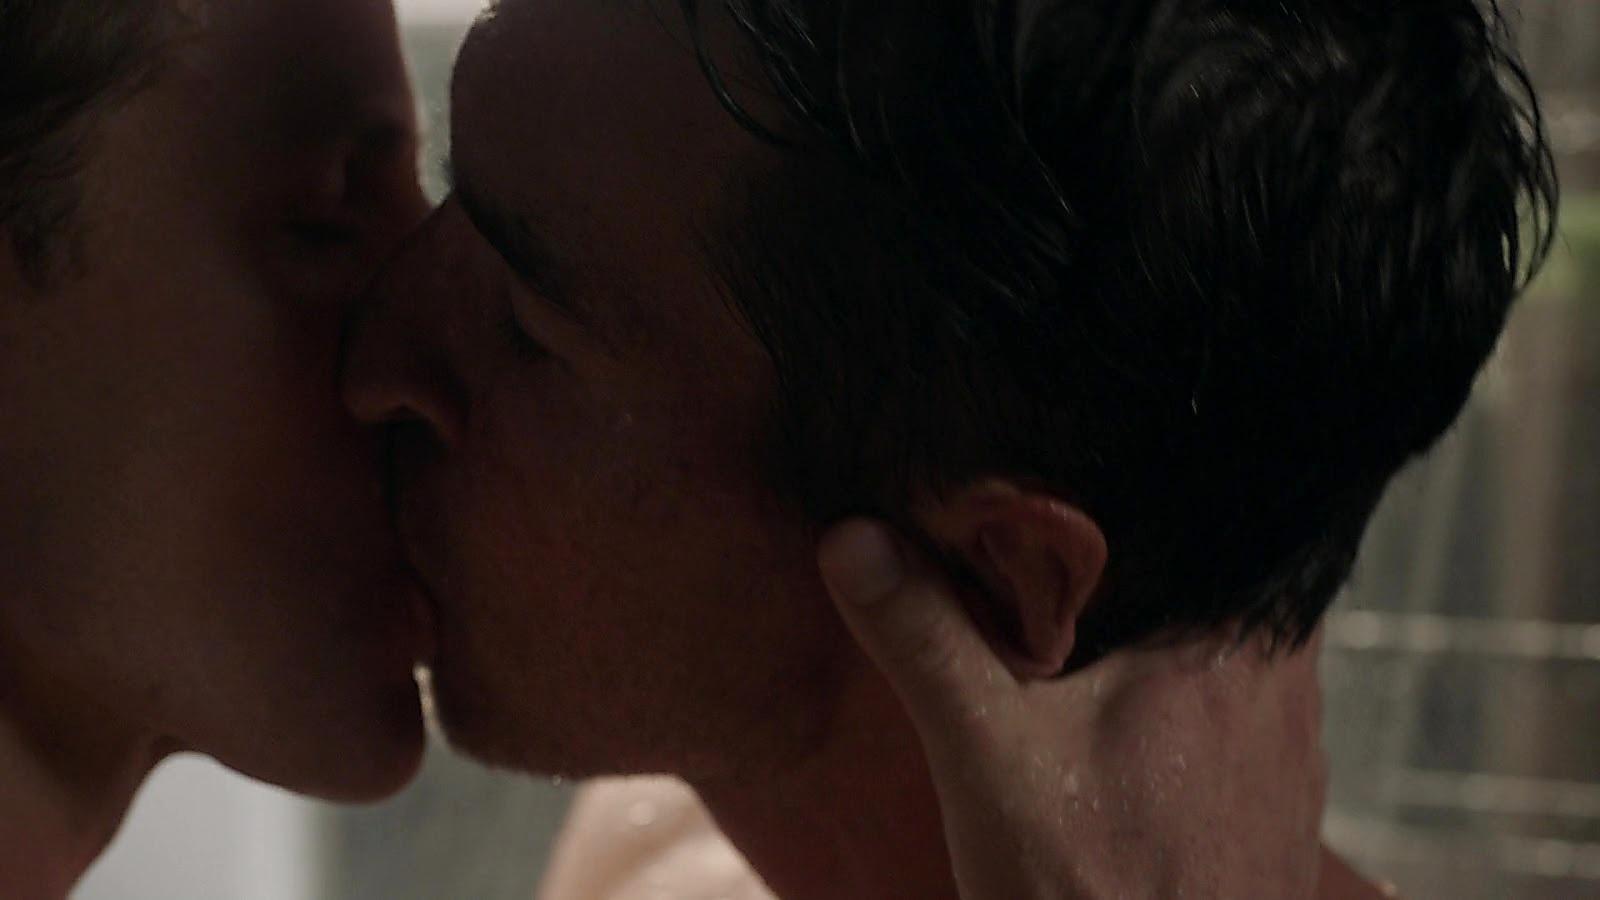 Jay Hayden sexy shirtless scene March 6, 2020, 8am